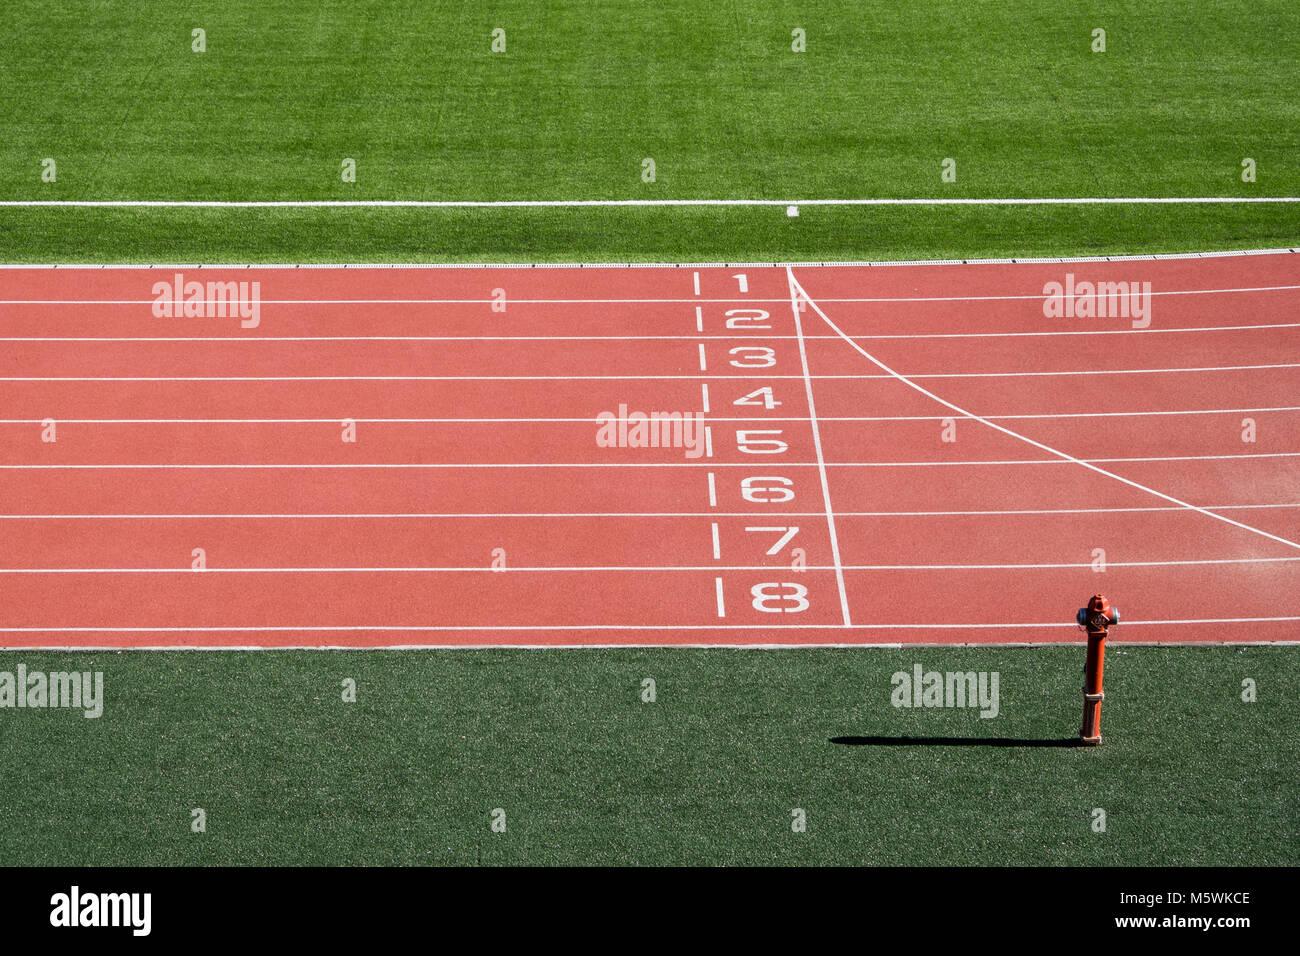 Runner First Track Stock Photos & Runner First Track Stock ...